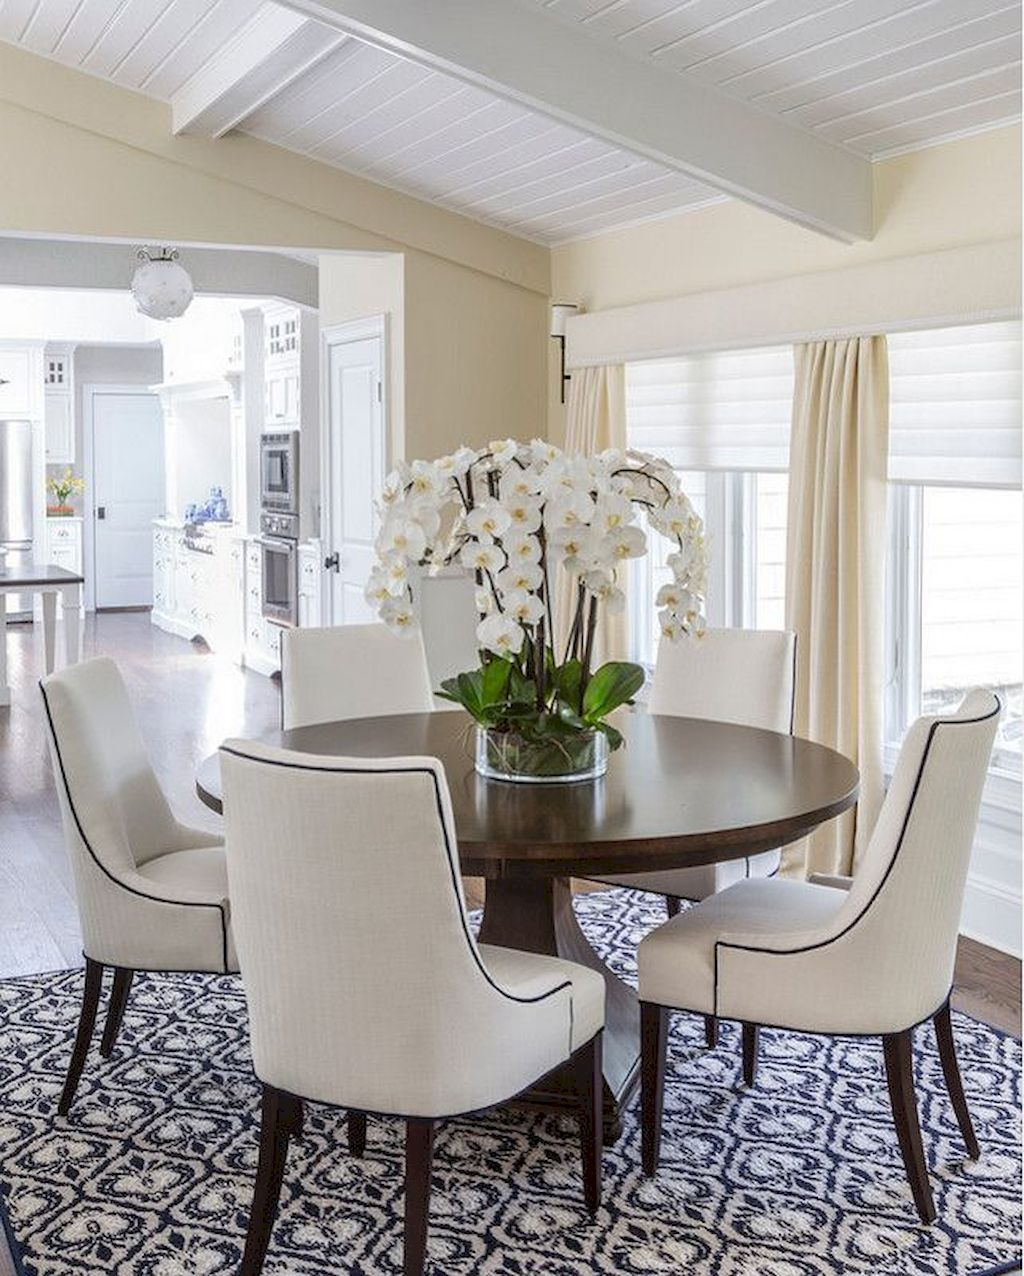 Admirable Dining Room Design Ideas 31